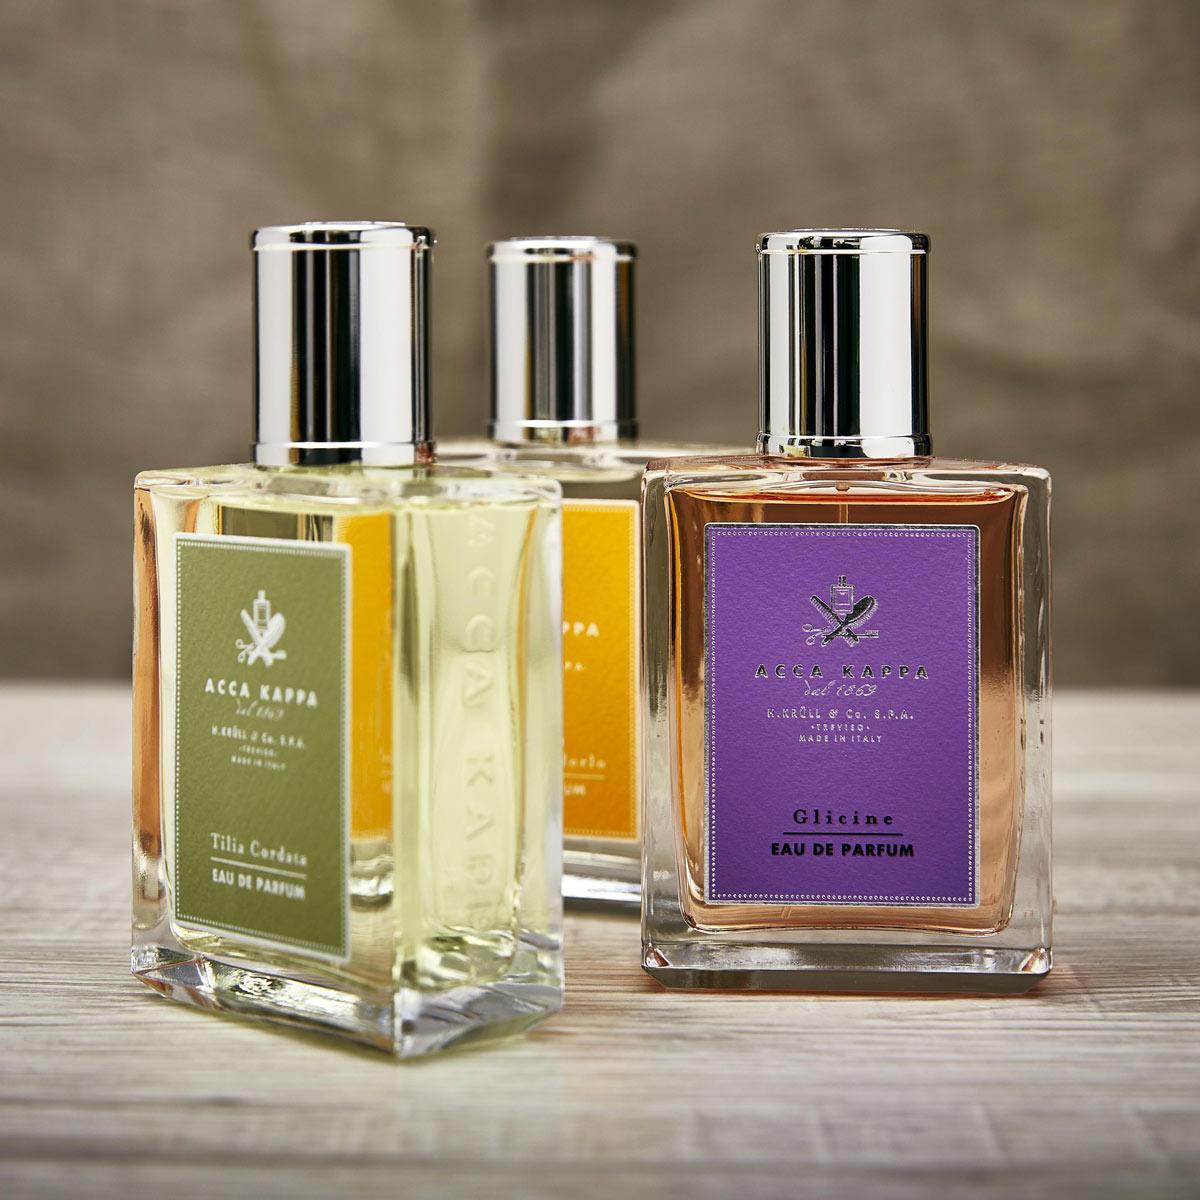 ACCA KAPPA Parfume